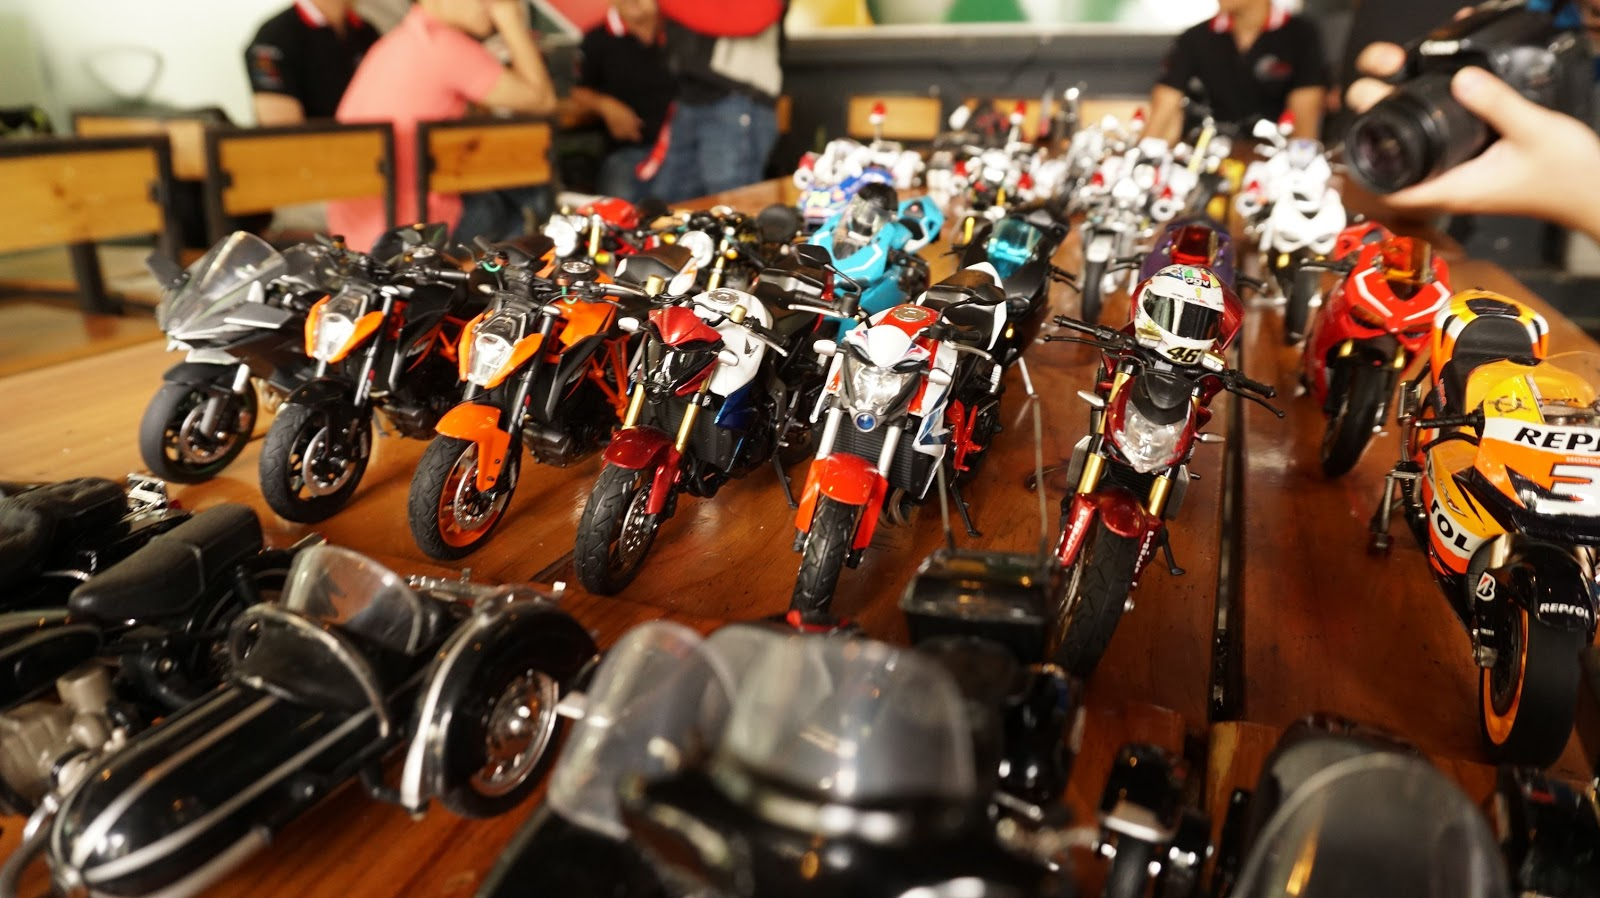 Mô hình siêu xe của Kawasaki, Ducati, Suzuki, Honda...đều tụ hội